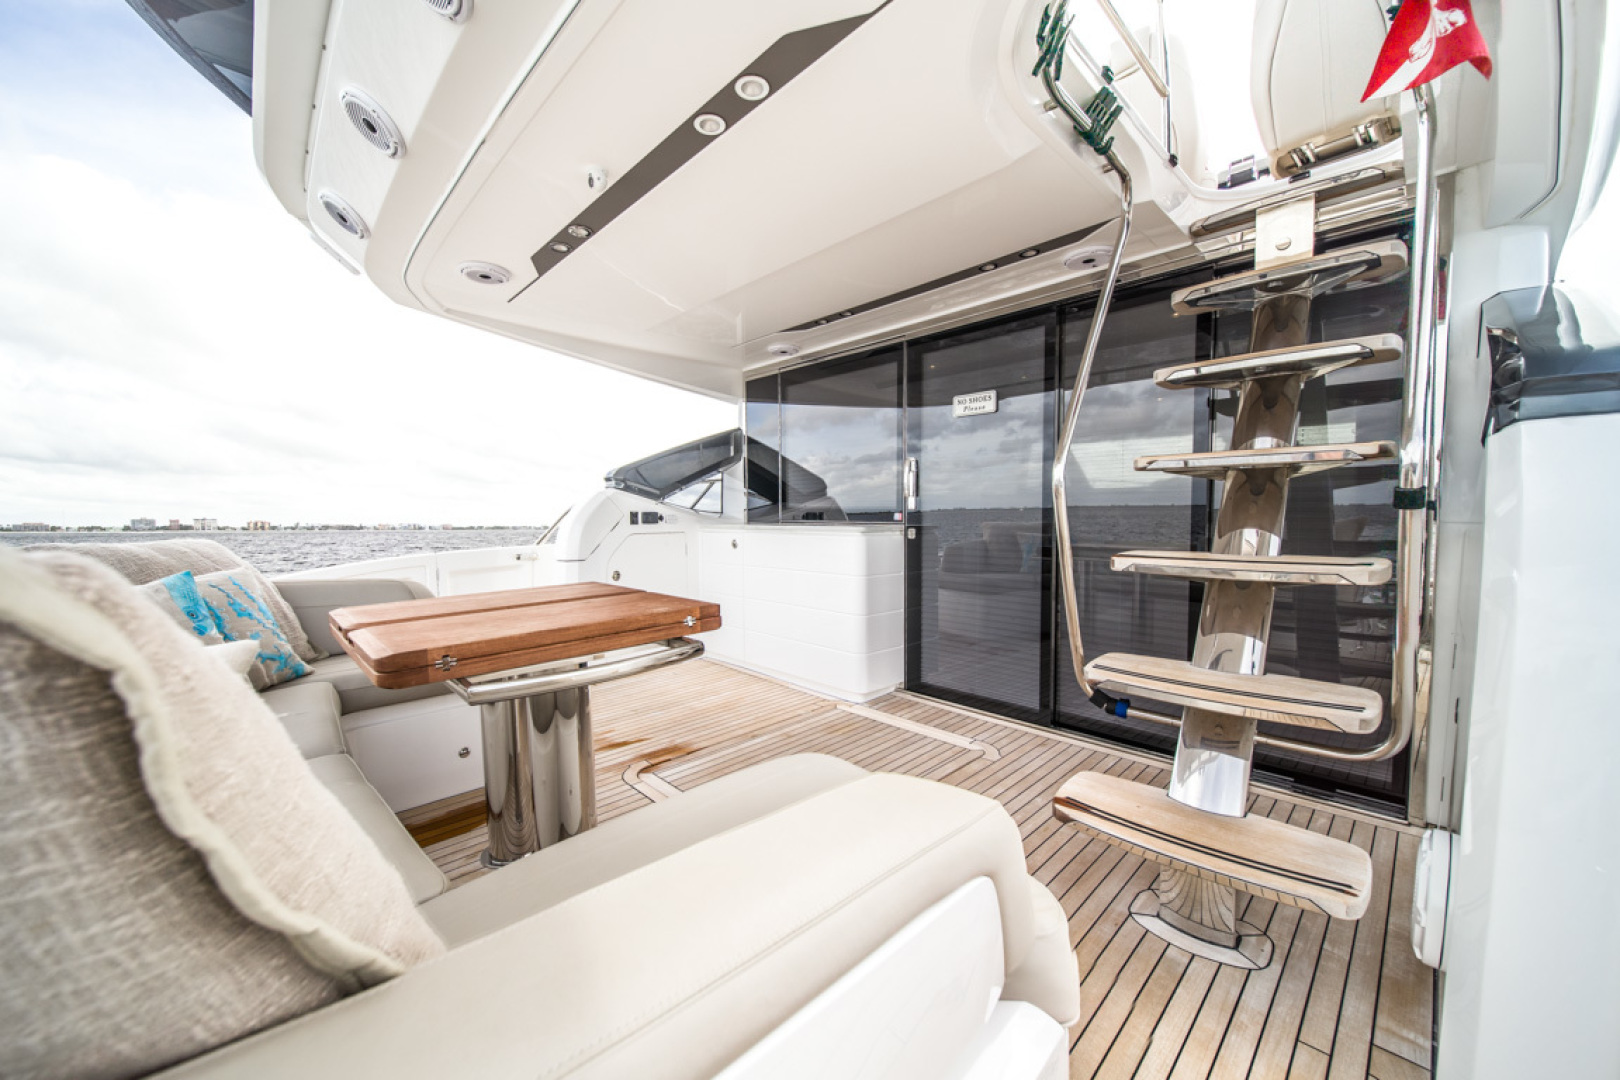 Princess-S65 2019-Paragon Cape Coral-Florida-United States-2019 65 Princess S65-Paragon-Cabin Entry-1510276 | Thumbnail